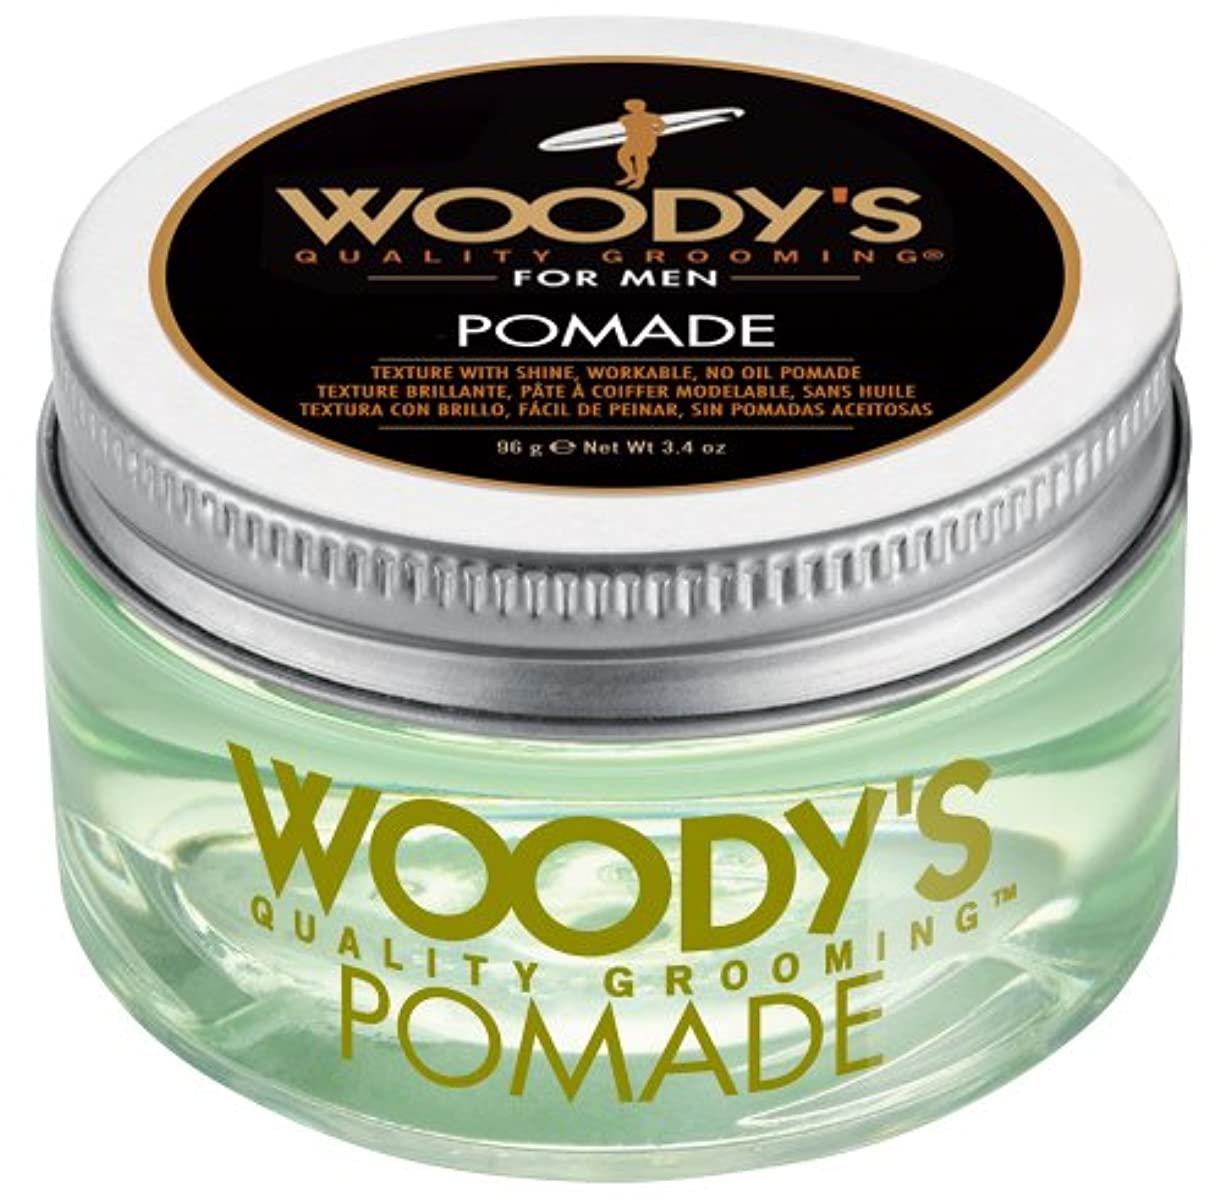 Woody's Pomade for Men, Pomade, 3.4 Ounce